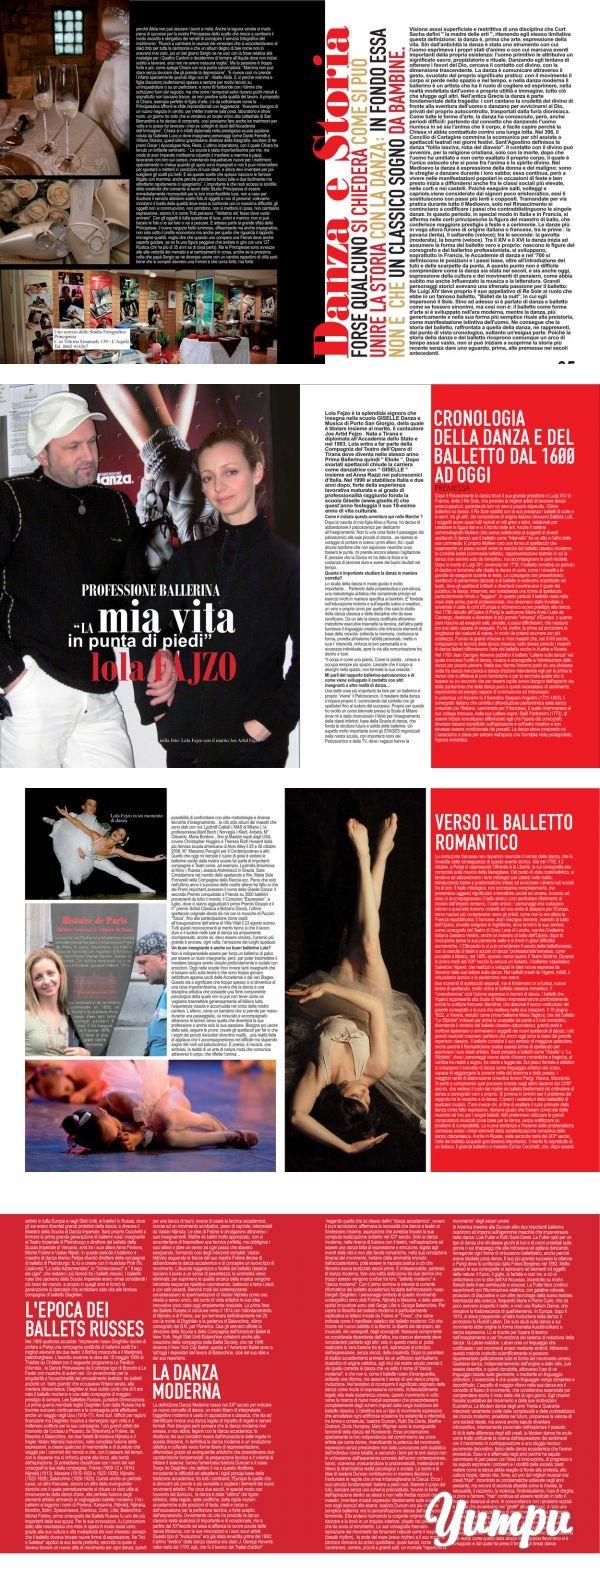 02 speciale donna SETTEMBRE.cdr - Donna Impresa Magazine - Magazine with 5 pages: 02 speciale donna SETTEMBRE.cdr - Donna Impresa Magazine